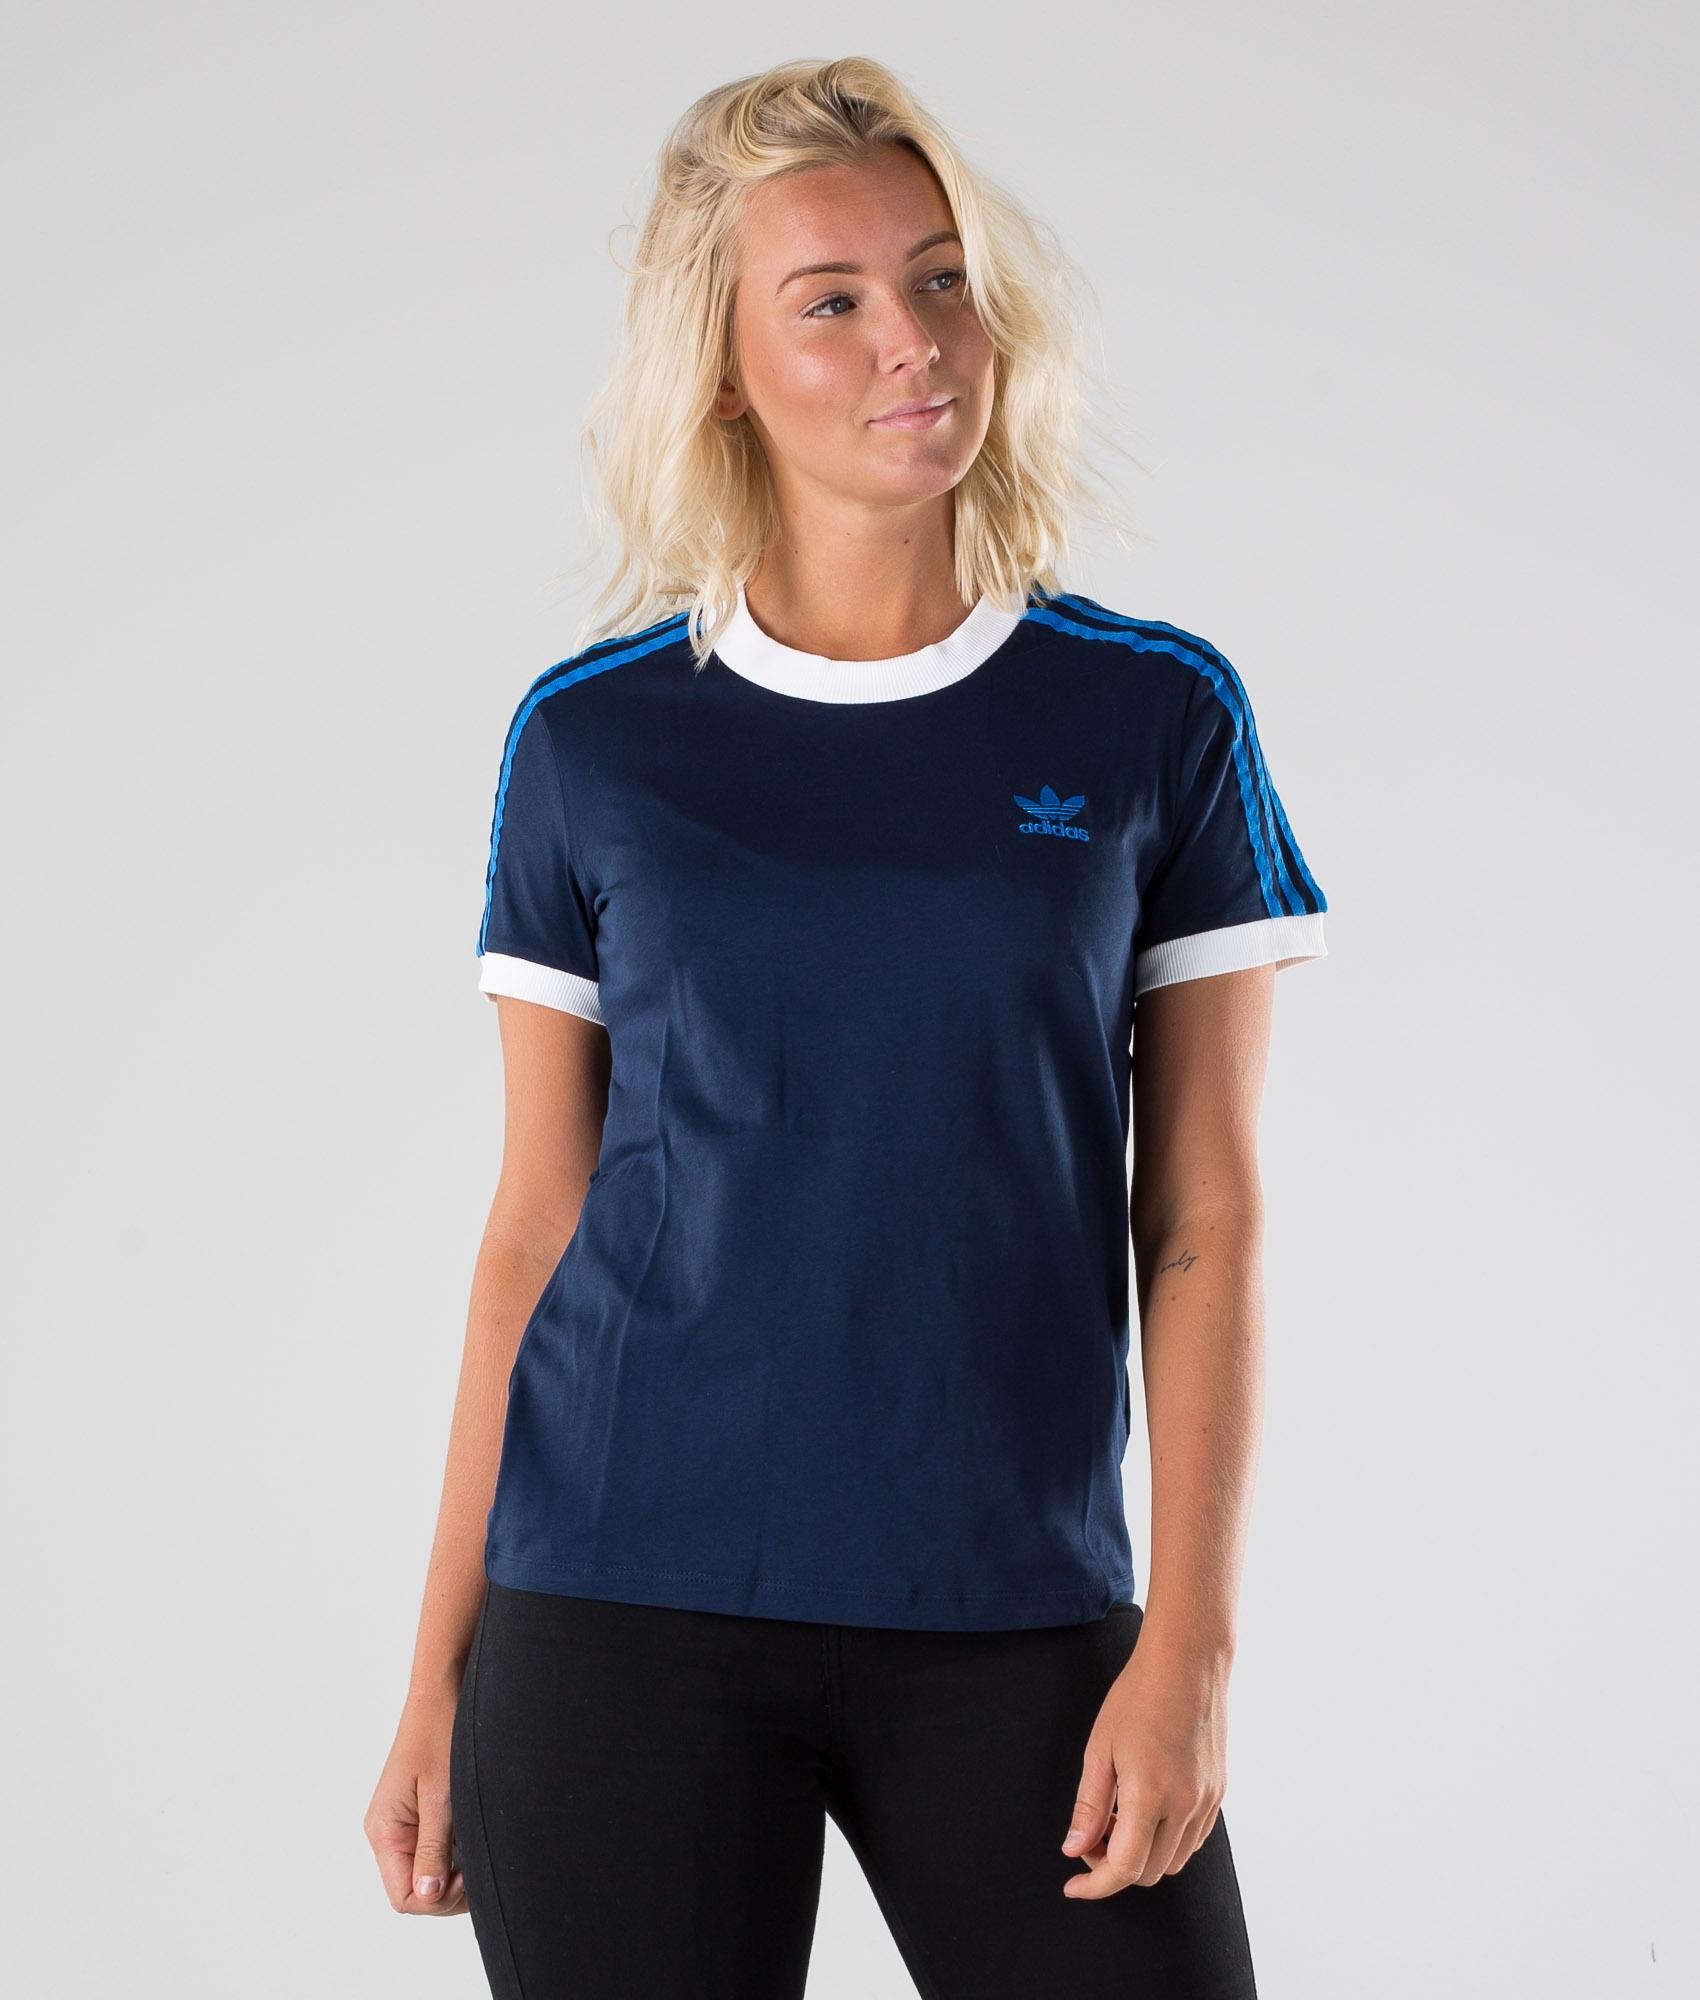 Adidas Originals 3 Stripes T shirt White Ridestore.se